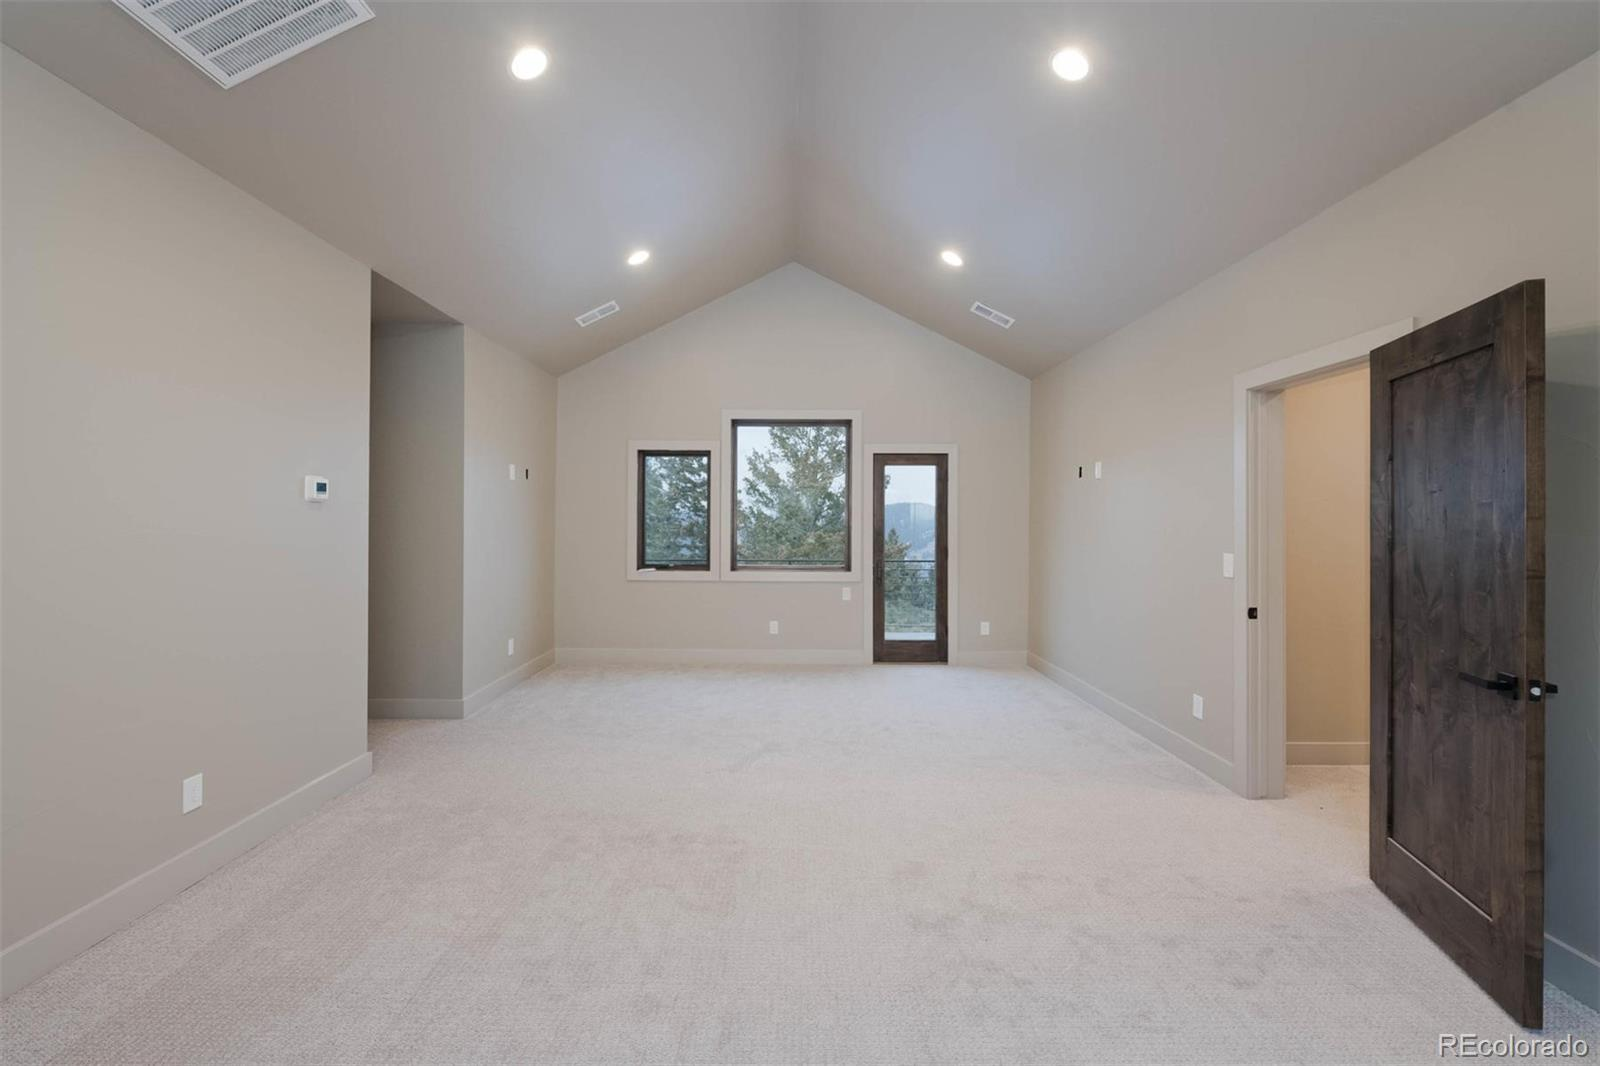 6135 Northway, Morrison, CO